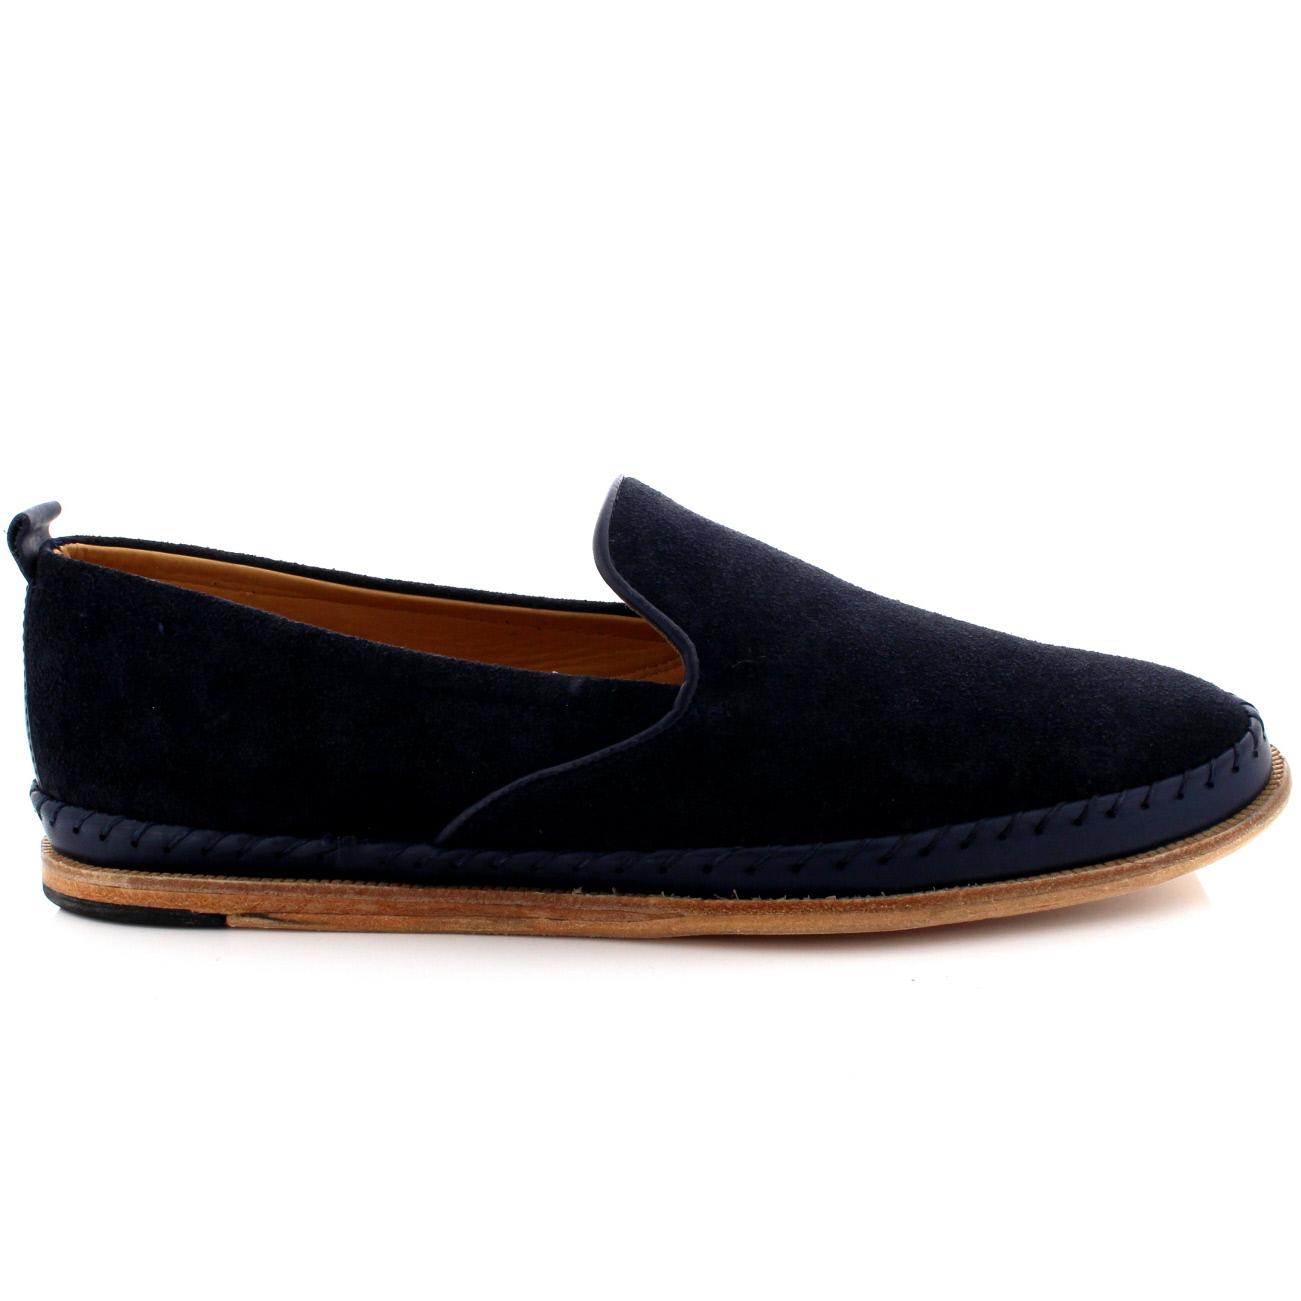 Mens H By Hudson Espadrille Shoes